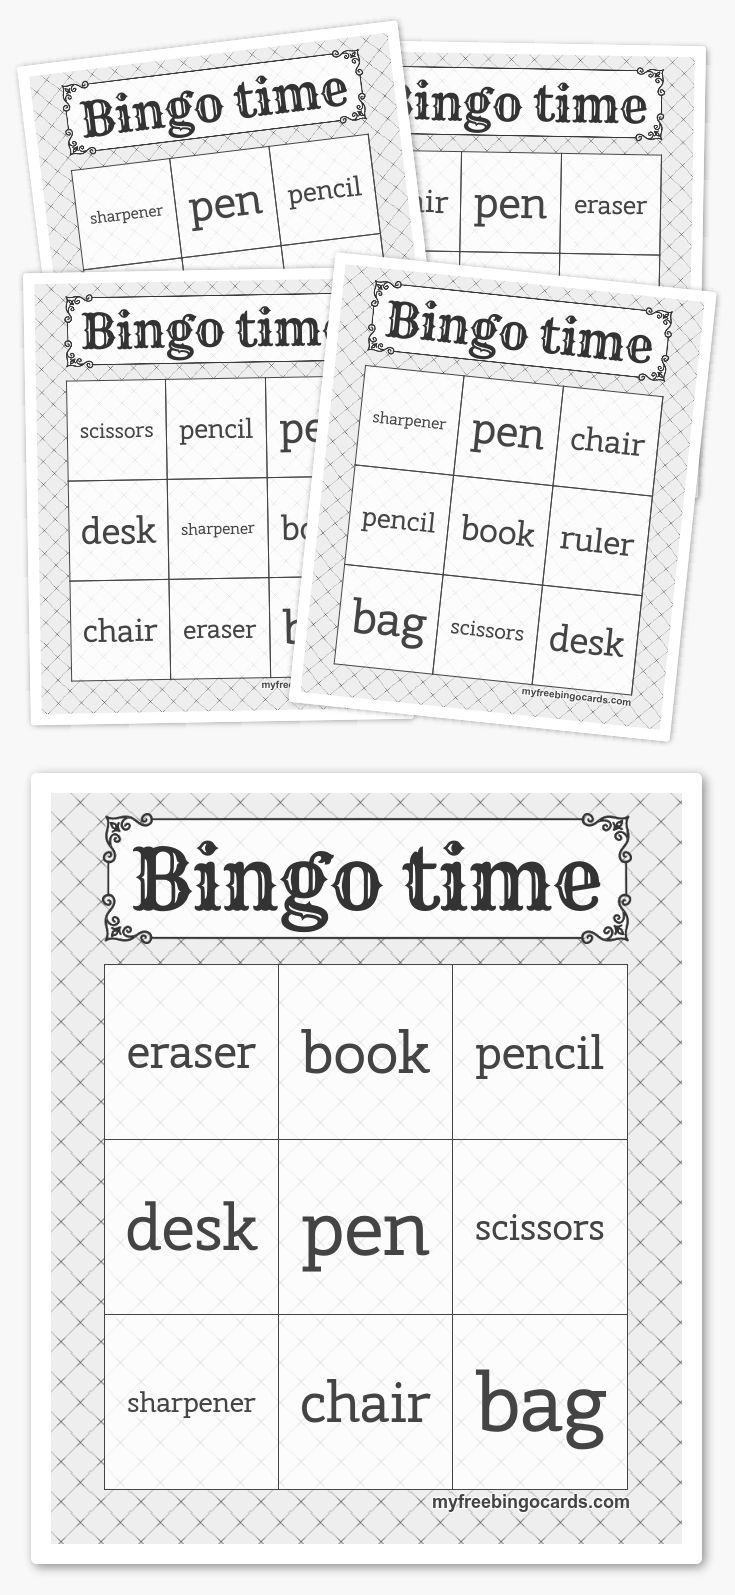 Excel bingo template gallery templates example free download excel bingo template gallery templates example free download bingo card generator microsoft excel certificate of attendance xflitez Gallery